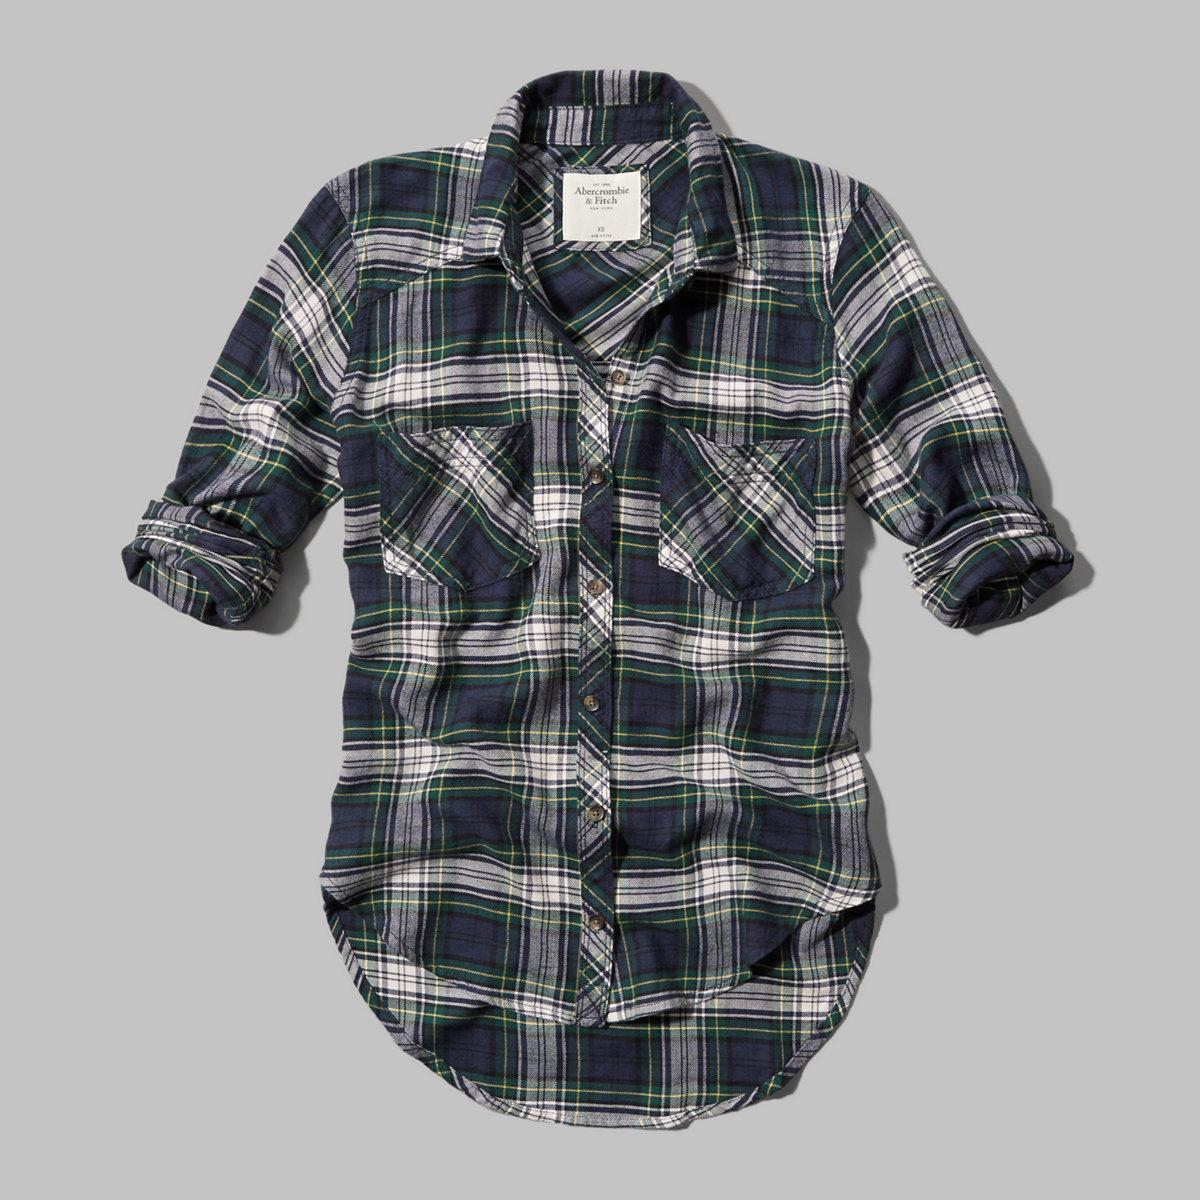 Benni Flannel Shirt